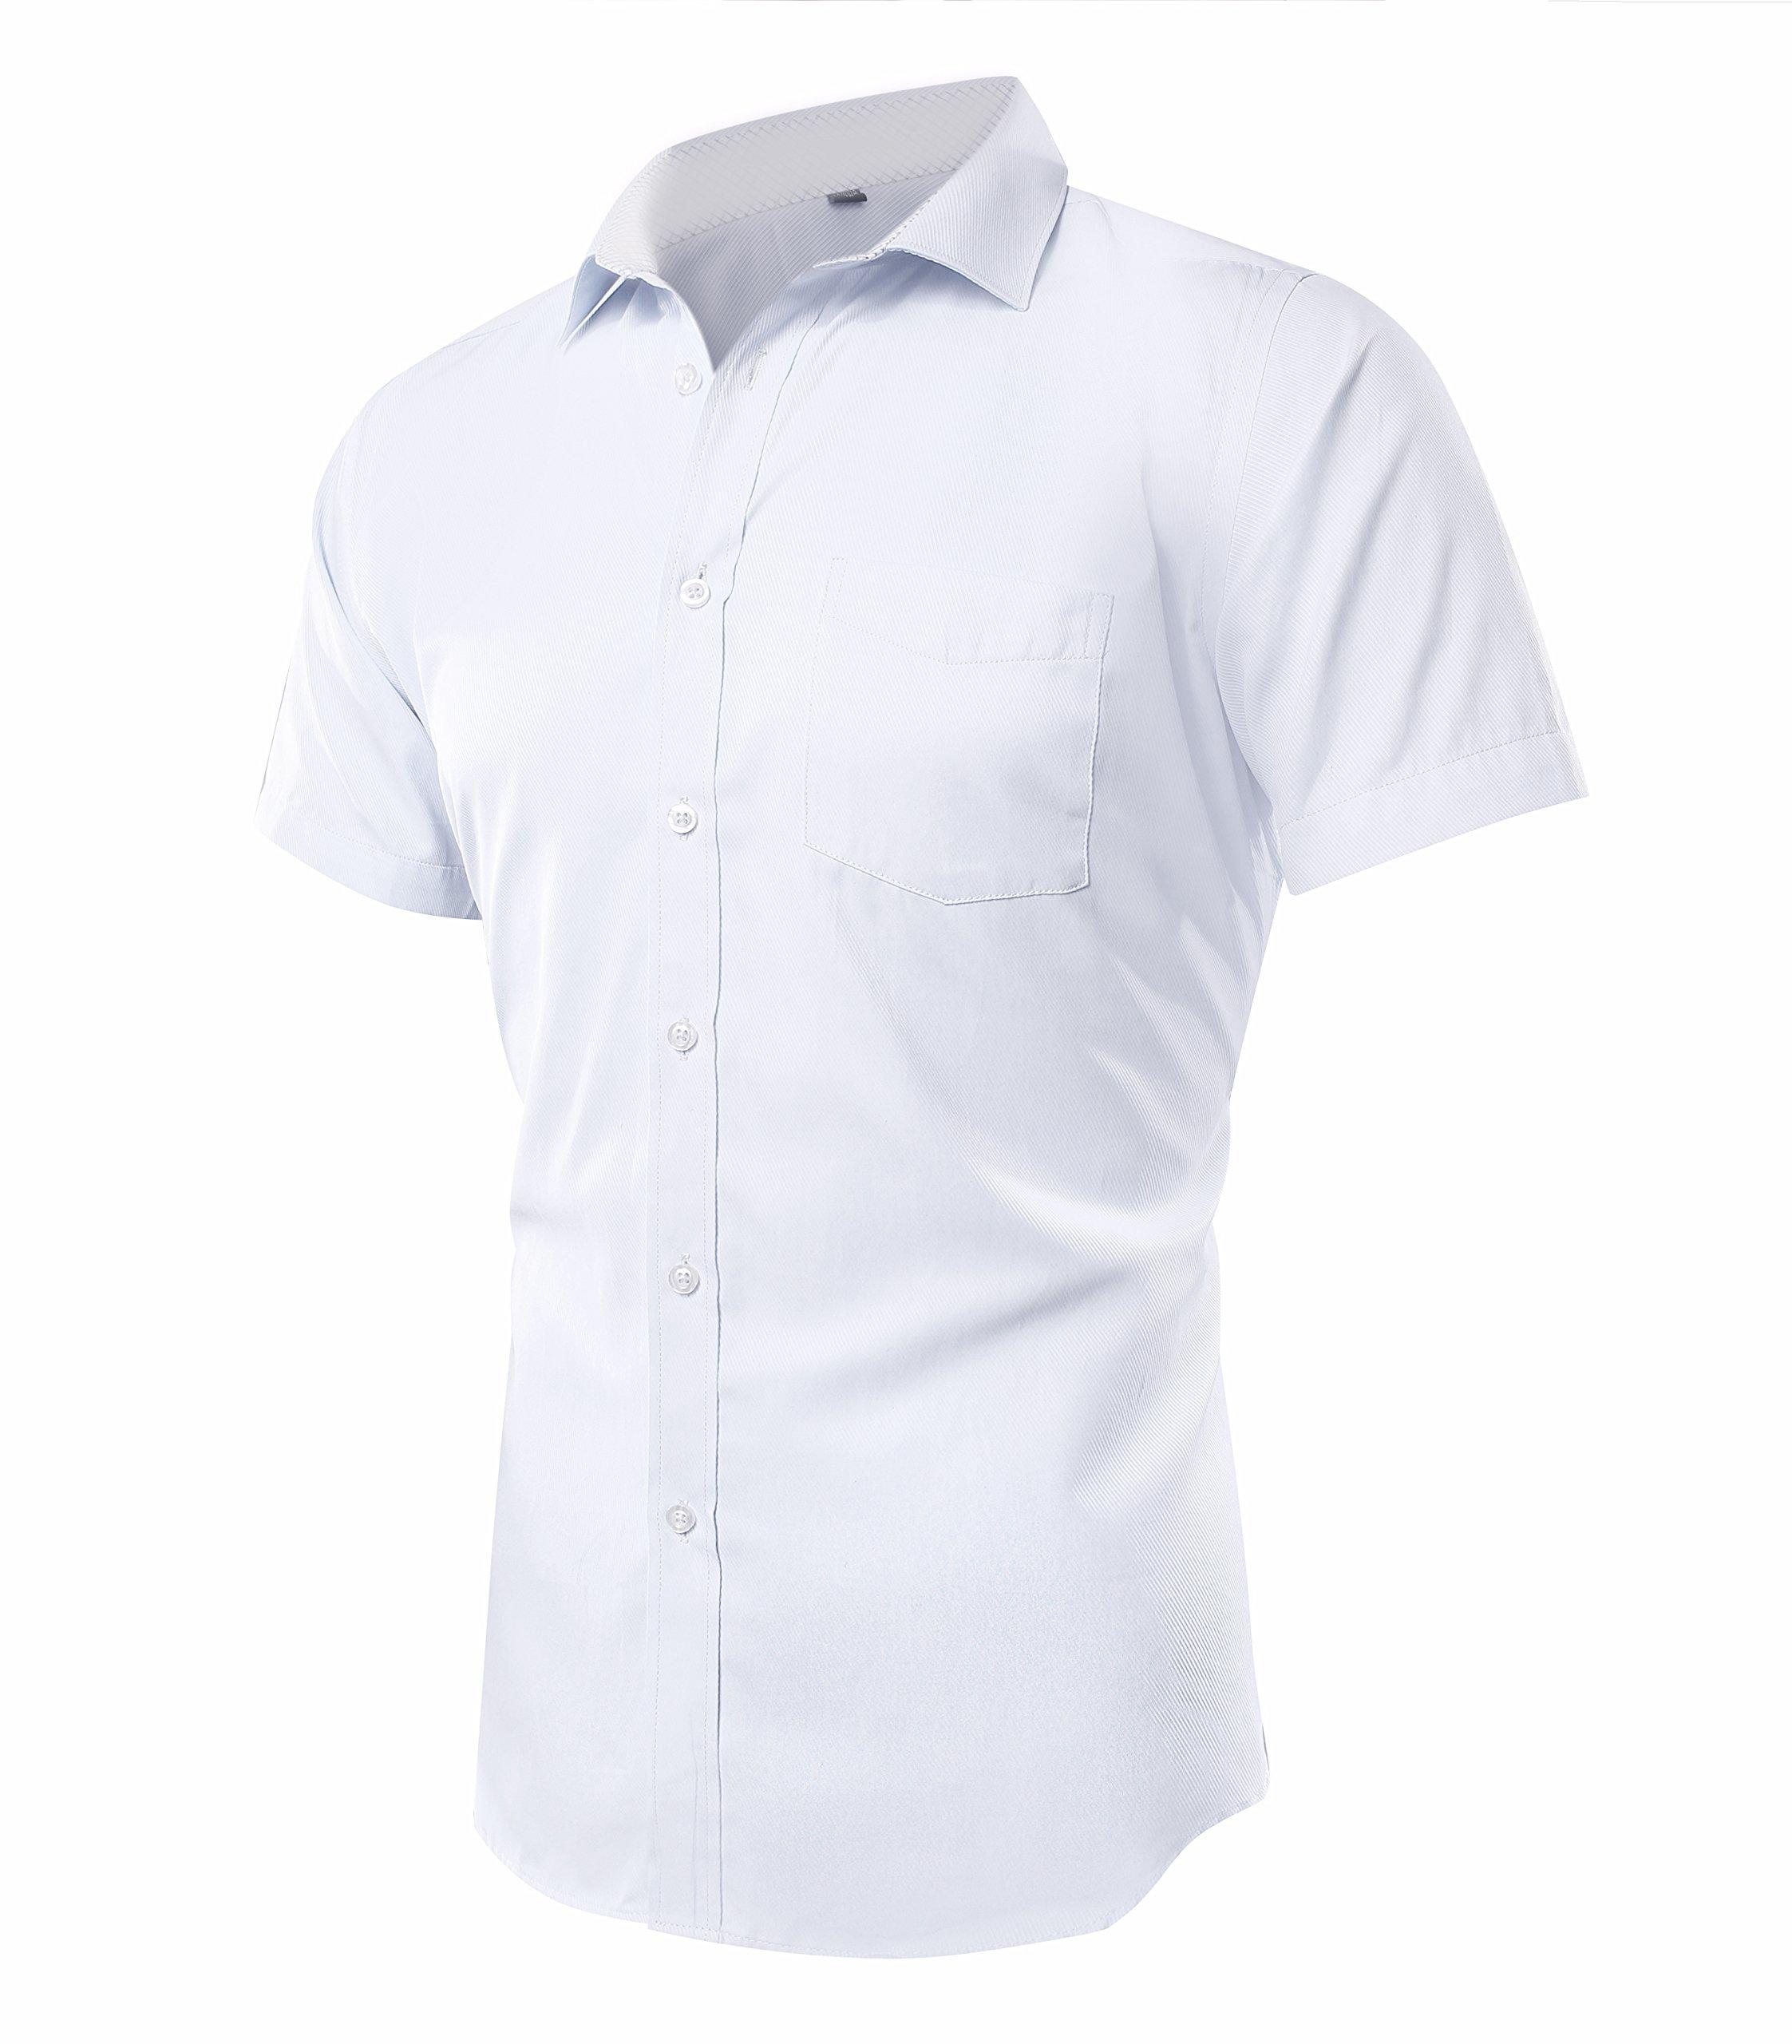 Musen Men Short Sleeve Dress Shirt Slim Fit Solid Shirts with Pocket White 41 by Musen Men (Image #2)